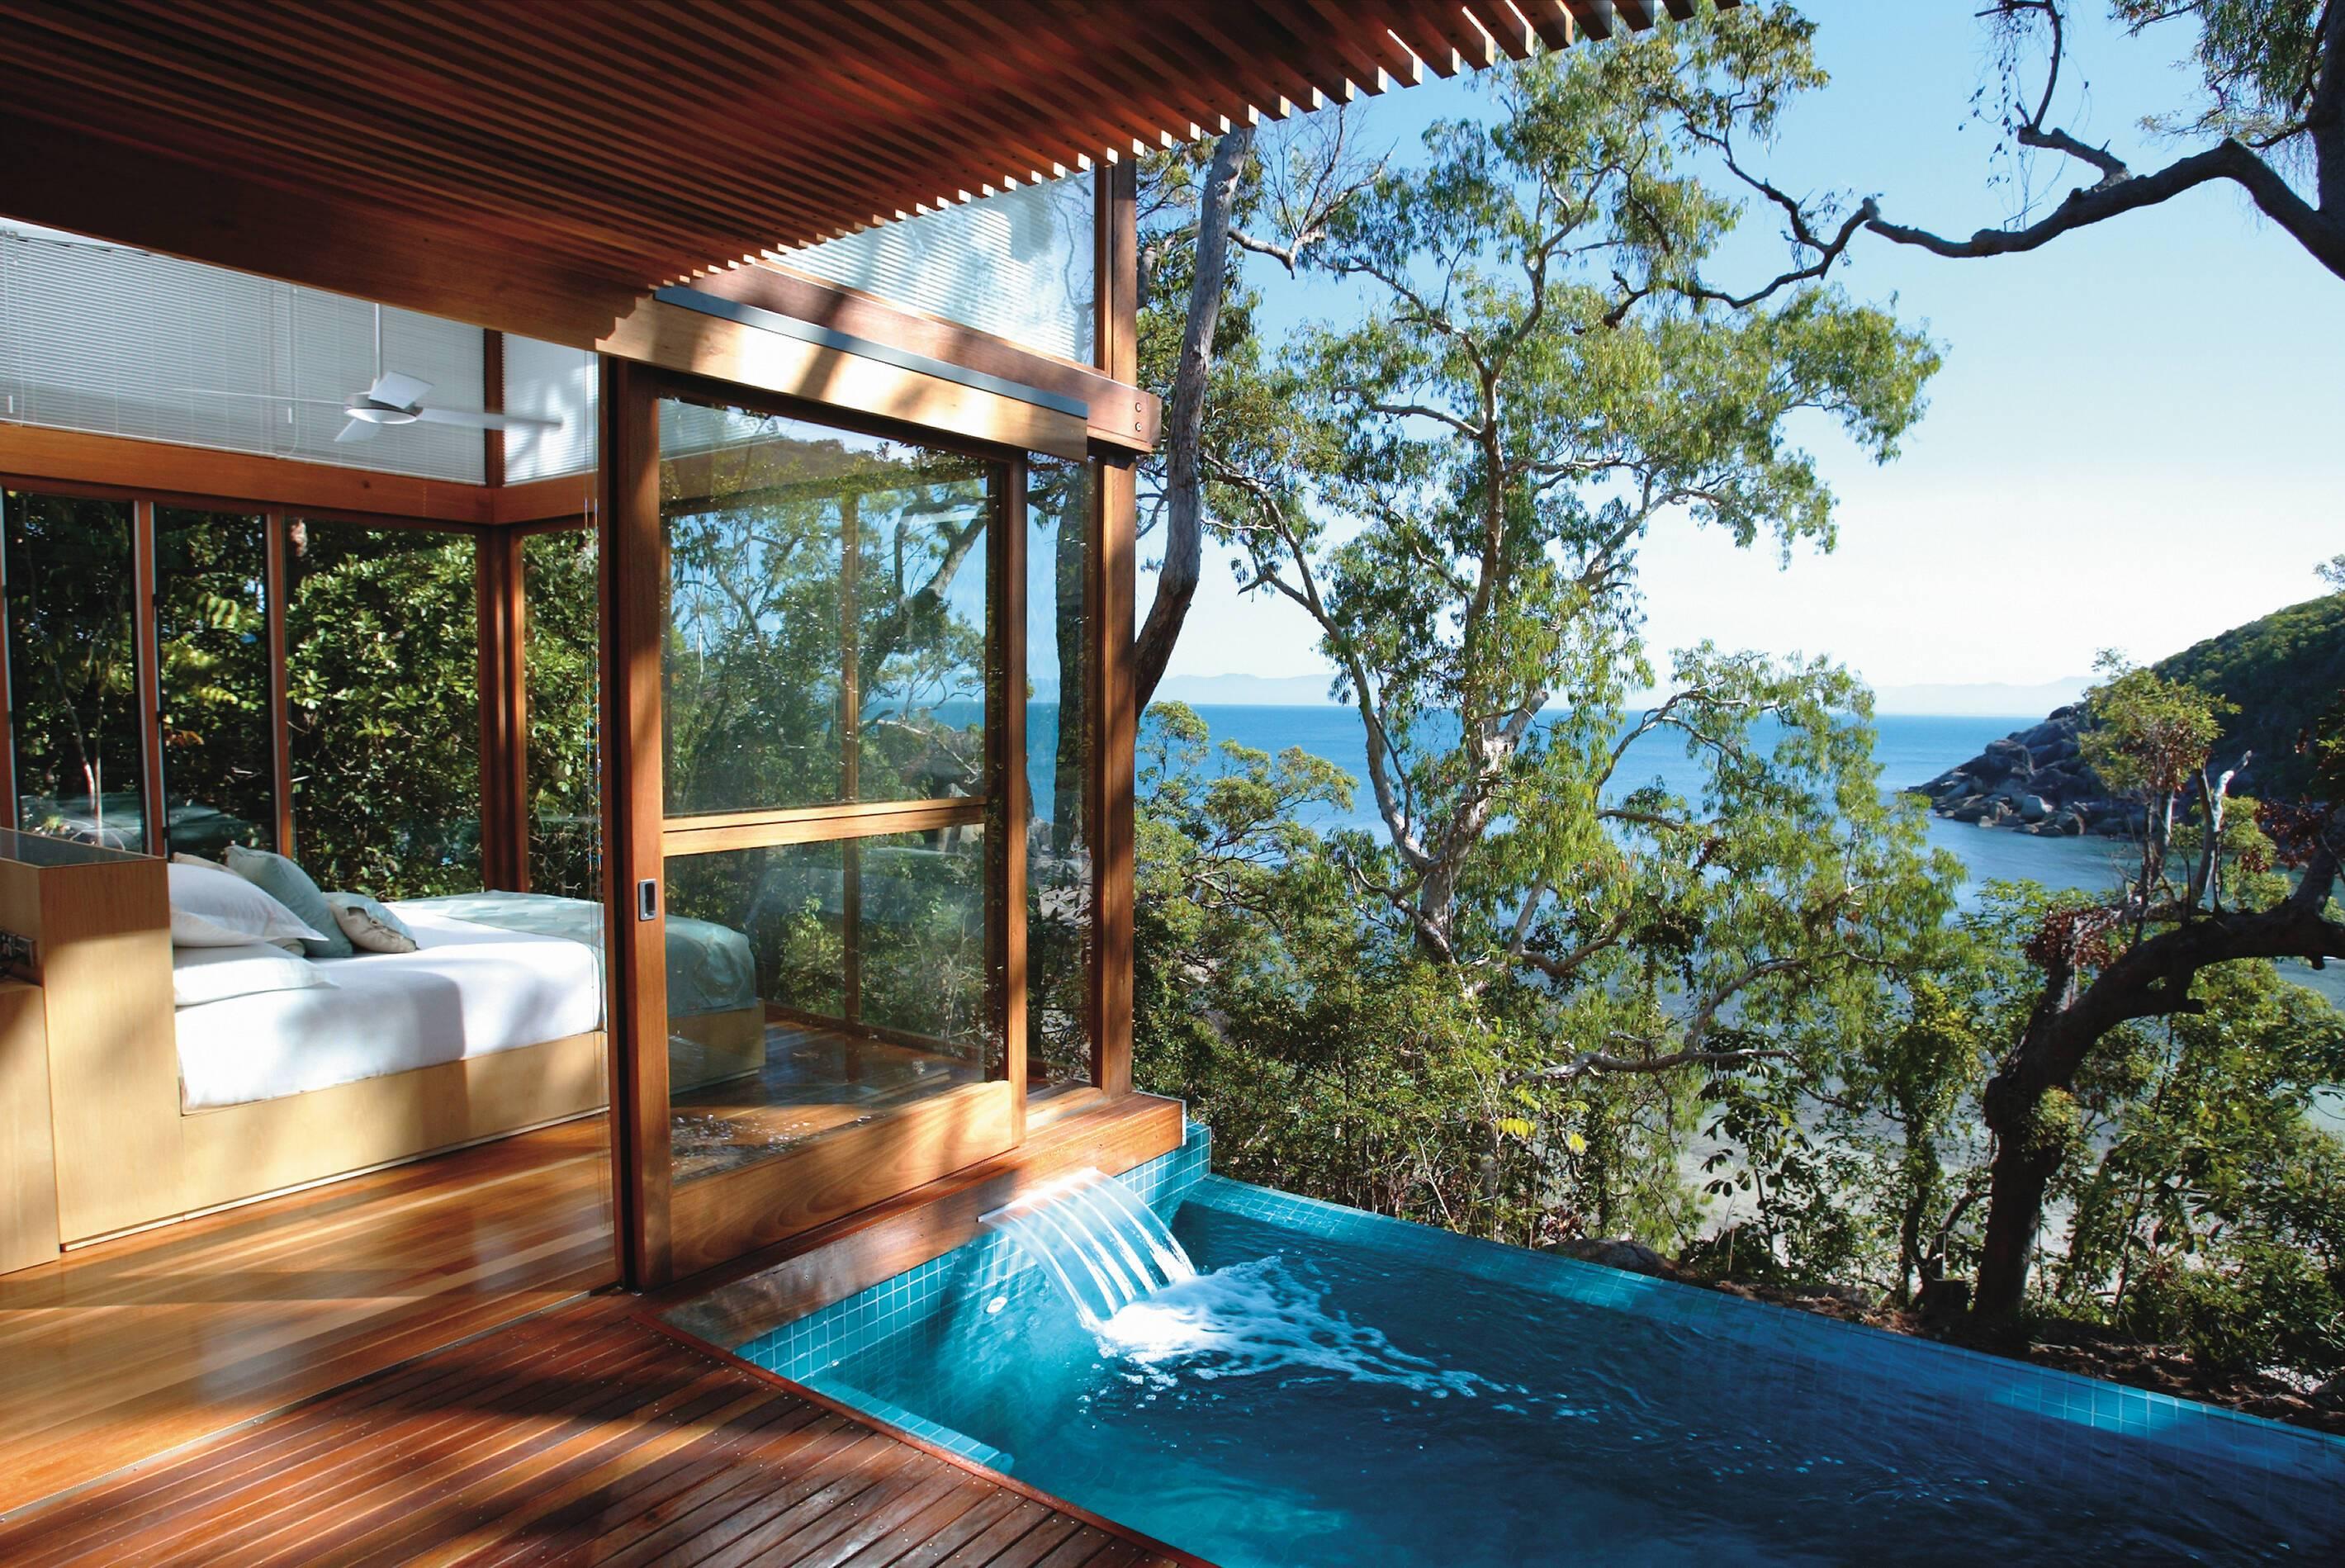 Bedarra Island Pavillon Chambre Piscine Australie